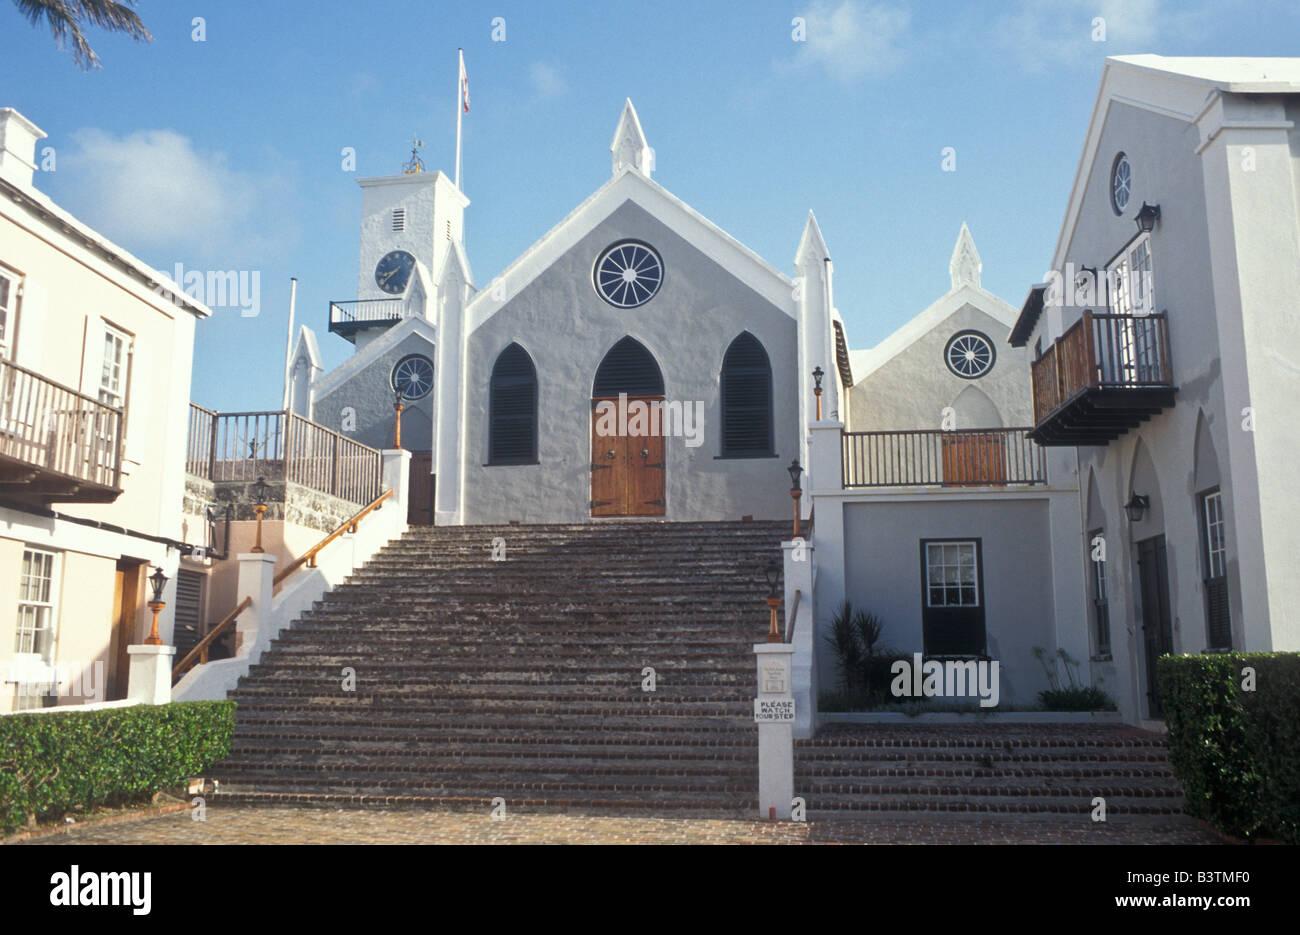 St Peter's Church, Duke Of York Street, St George, Bermuda - Stock Image